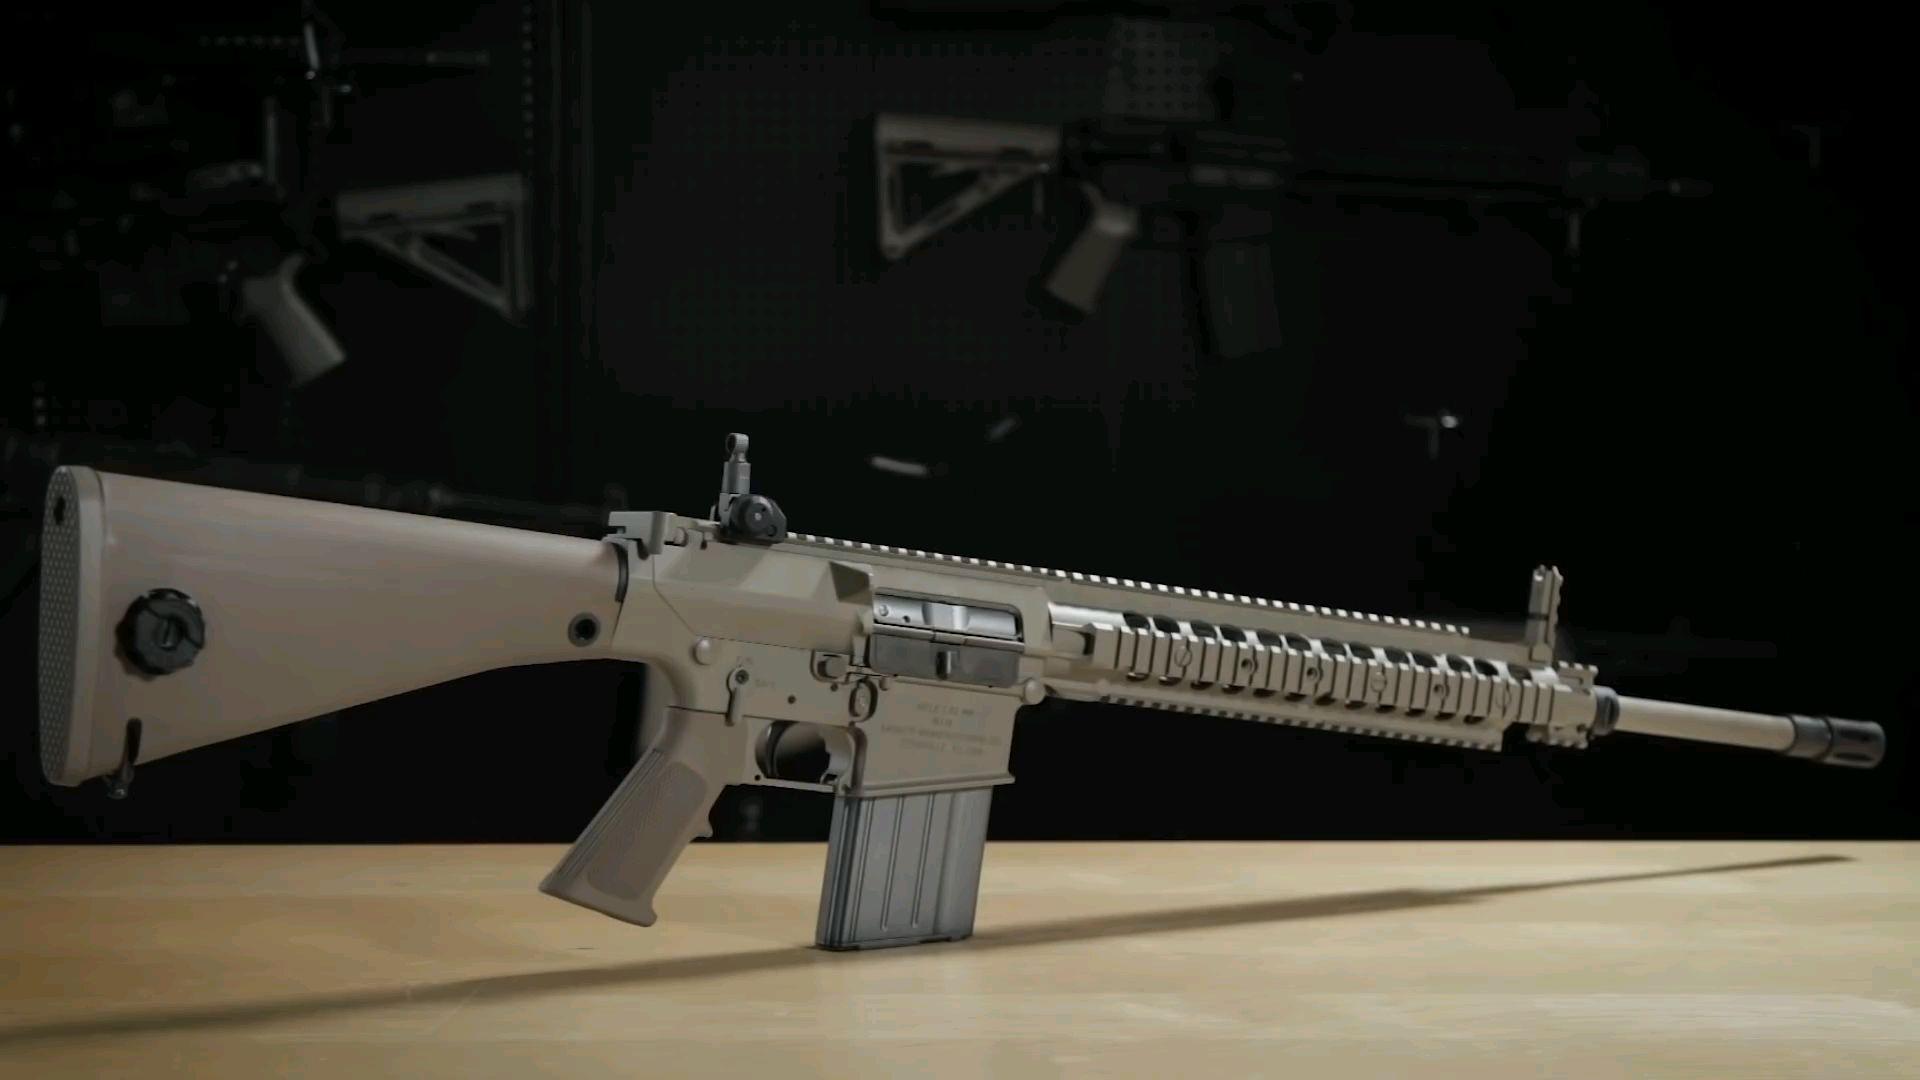 【Redwolf Airsoft】VFC KAC M110 气动回膛半自动精确小铳介绍